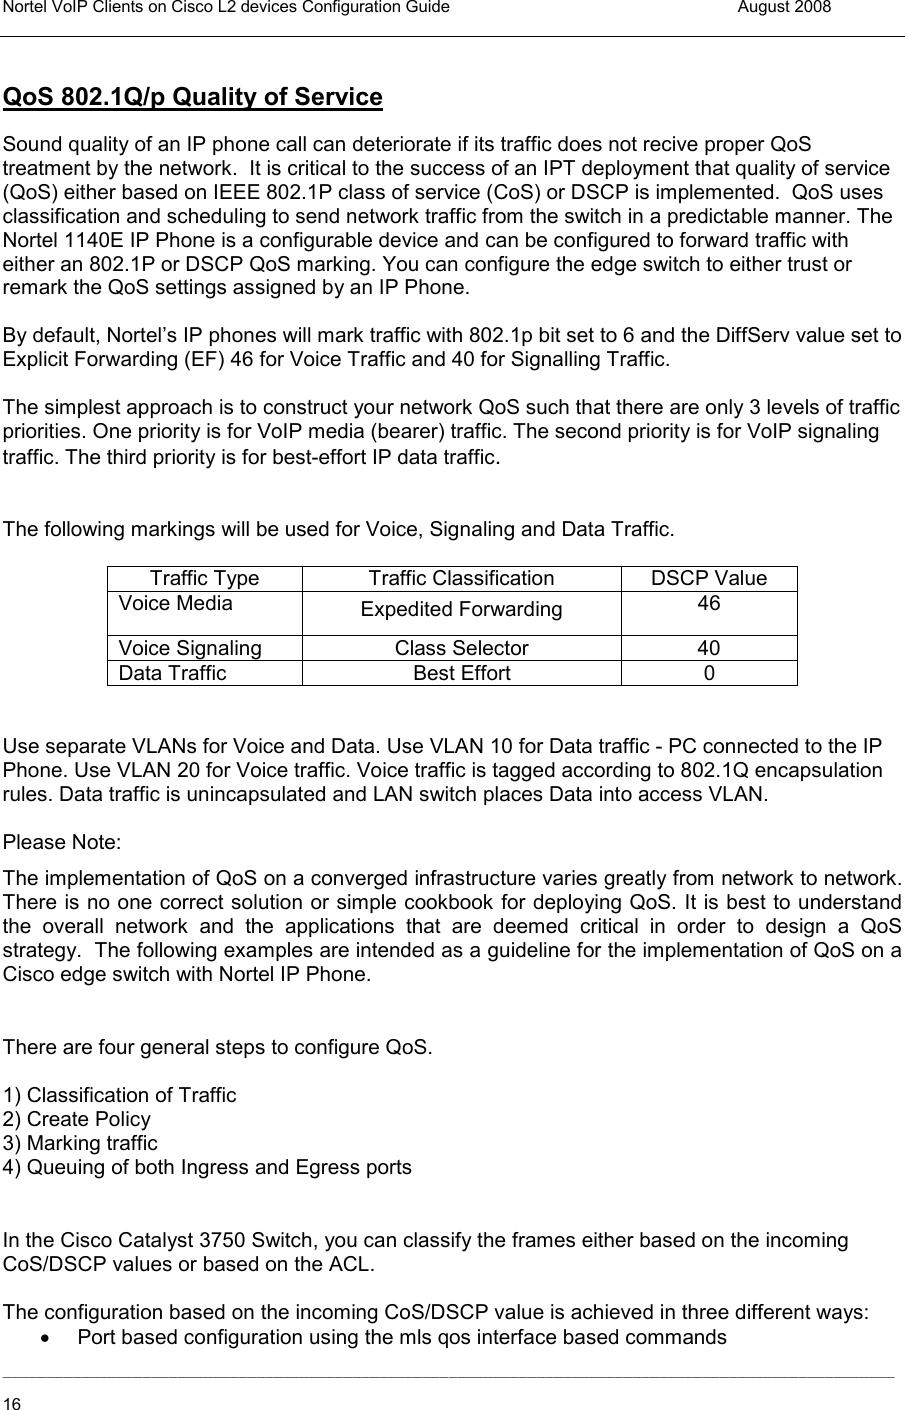 Avaya Ip Phone Inter Working With Cisco L2 Switches